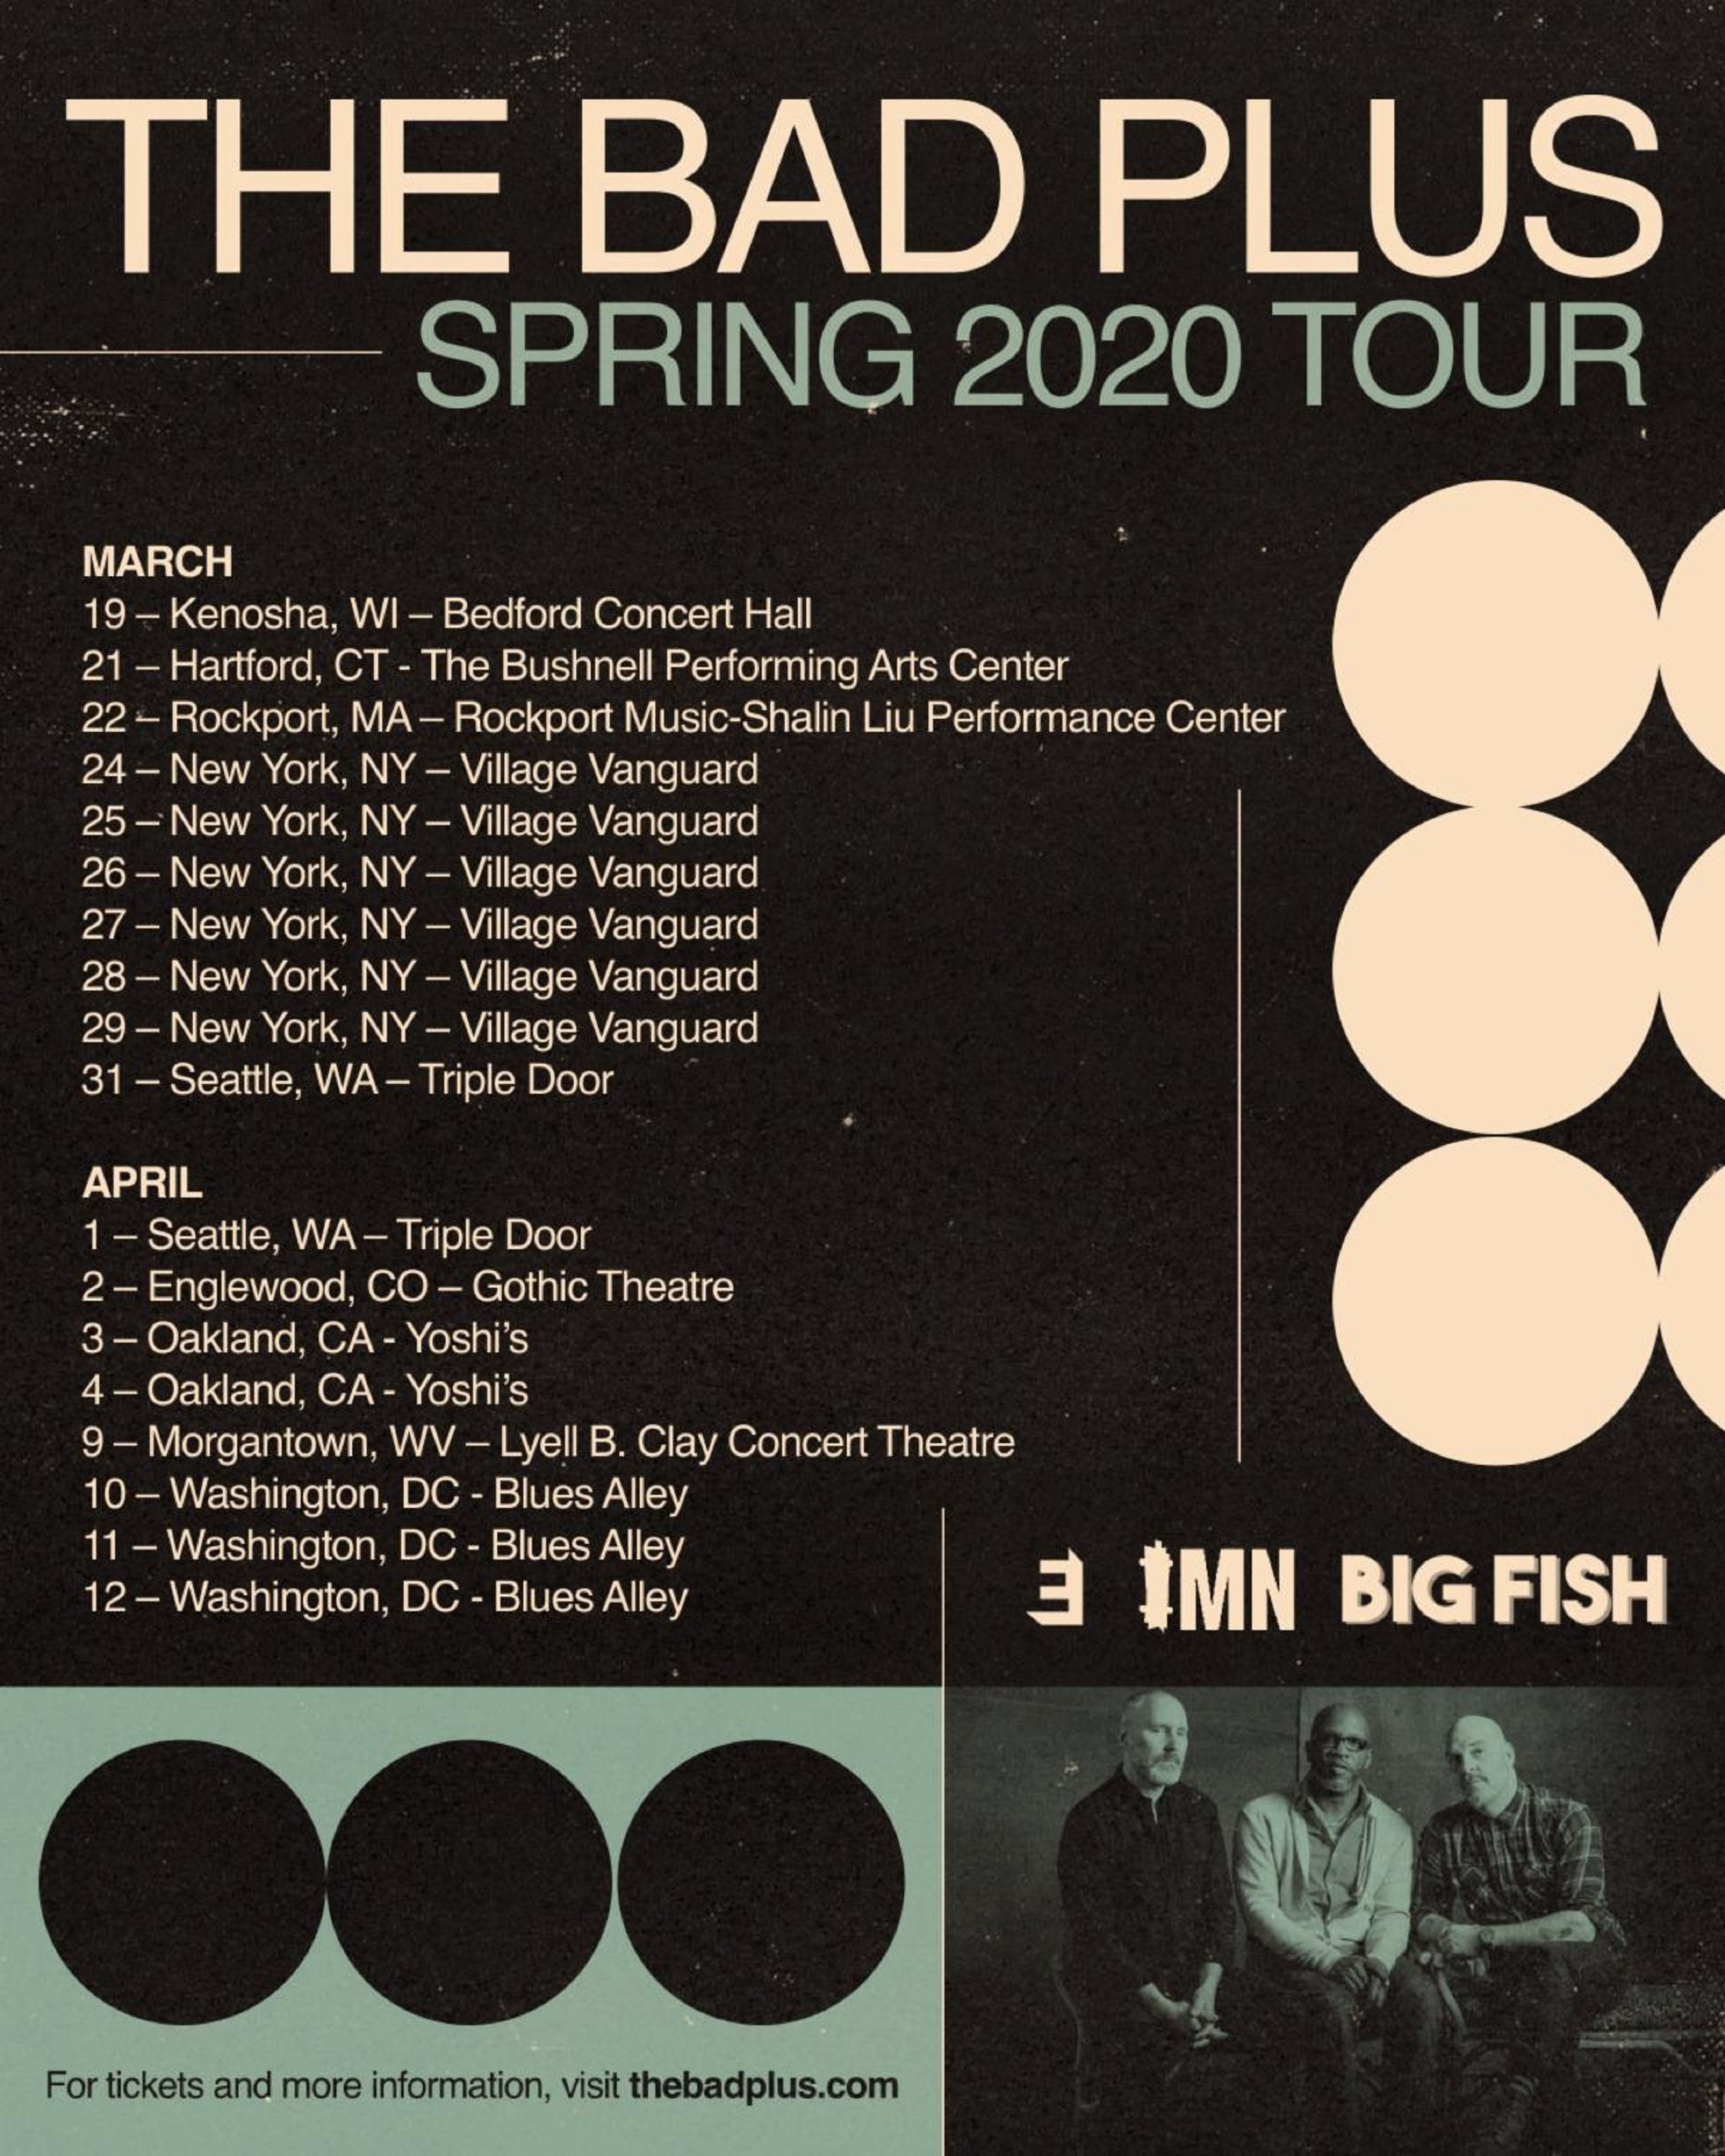 The Bad Plus Confirm 2020 Spring Tour | Grateful Web inside Blues Alley Schedule 2021